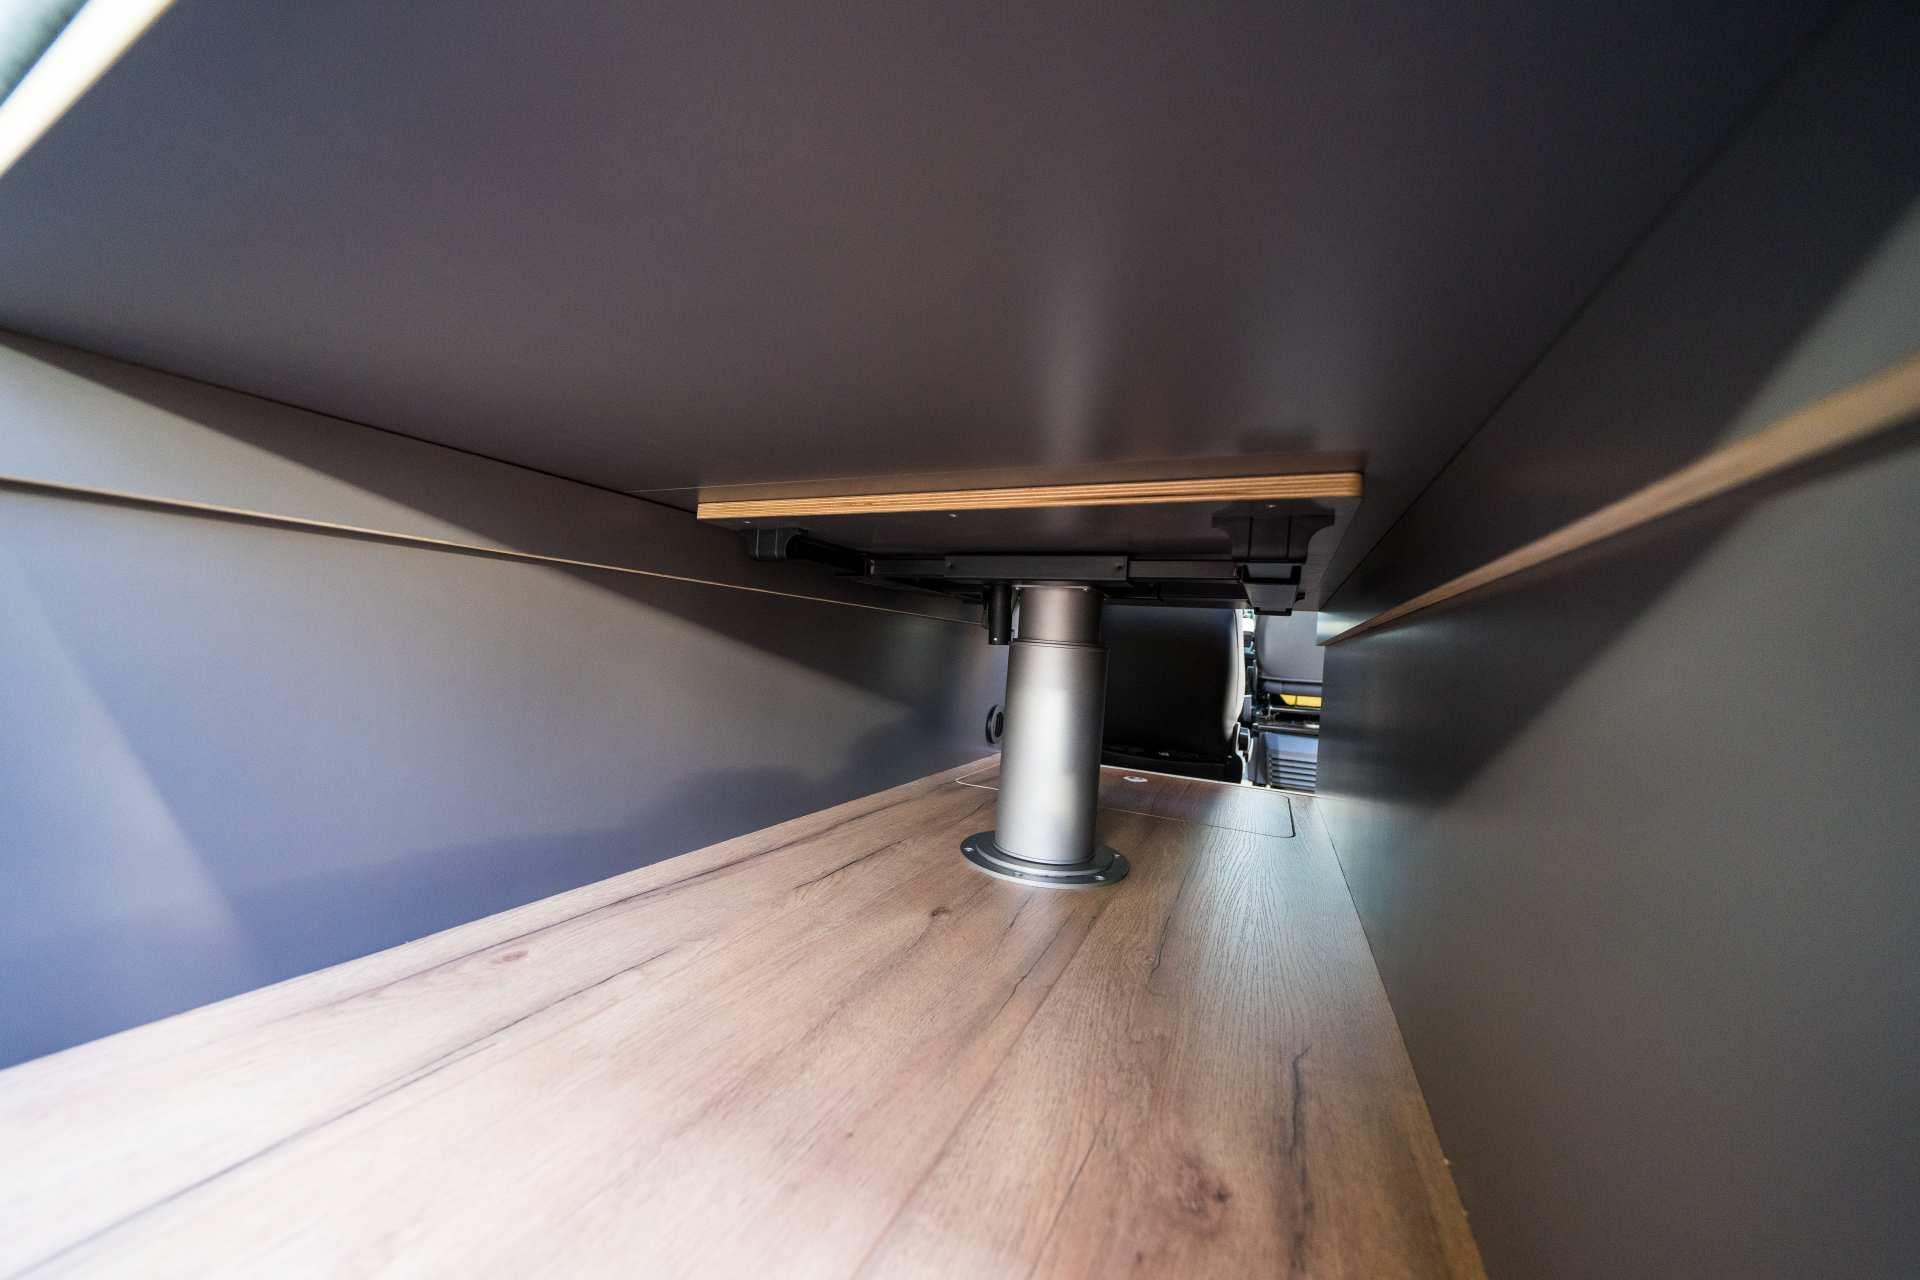 Individualausbau: Zwei-Raumwohnung Peugeot Boxer L2 H2 - 21